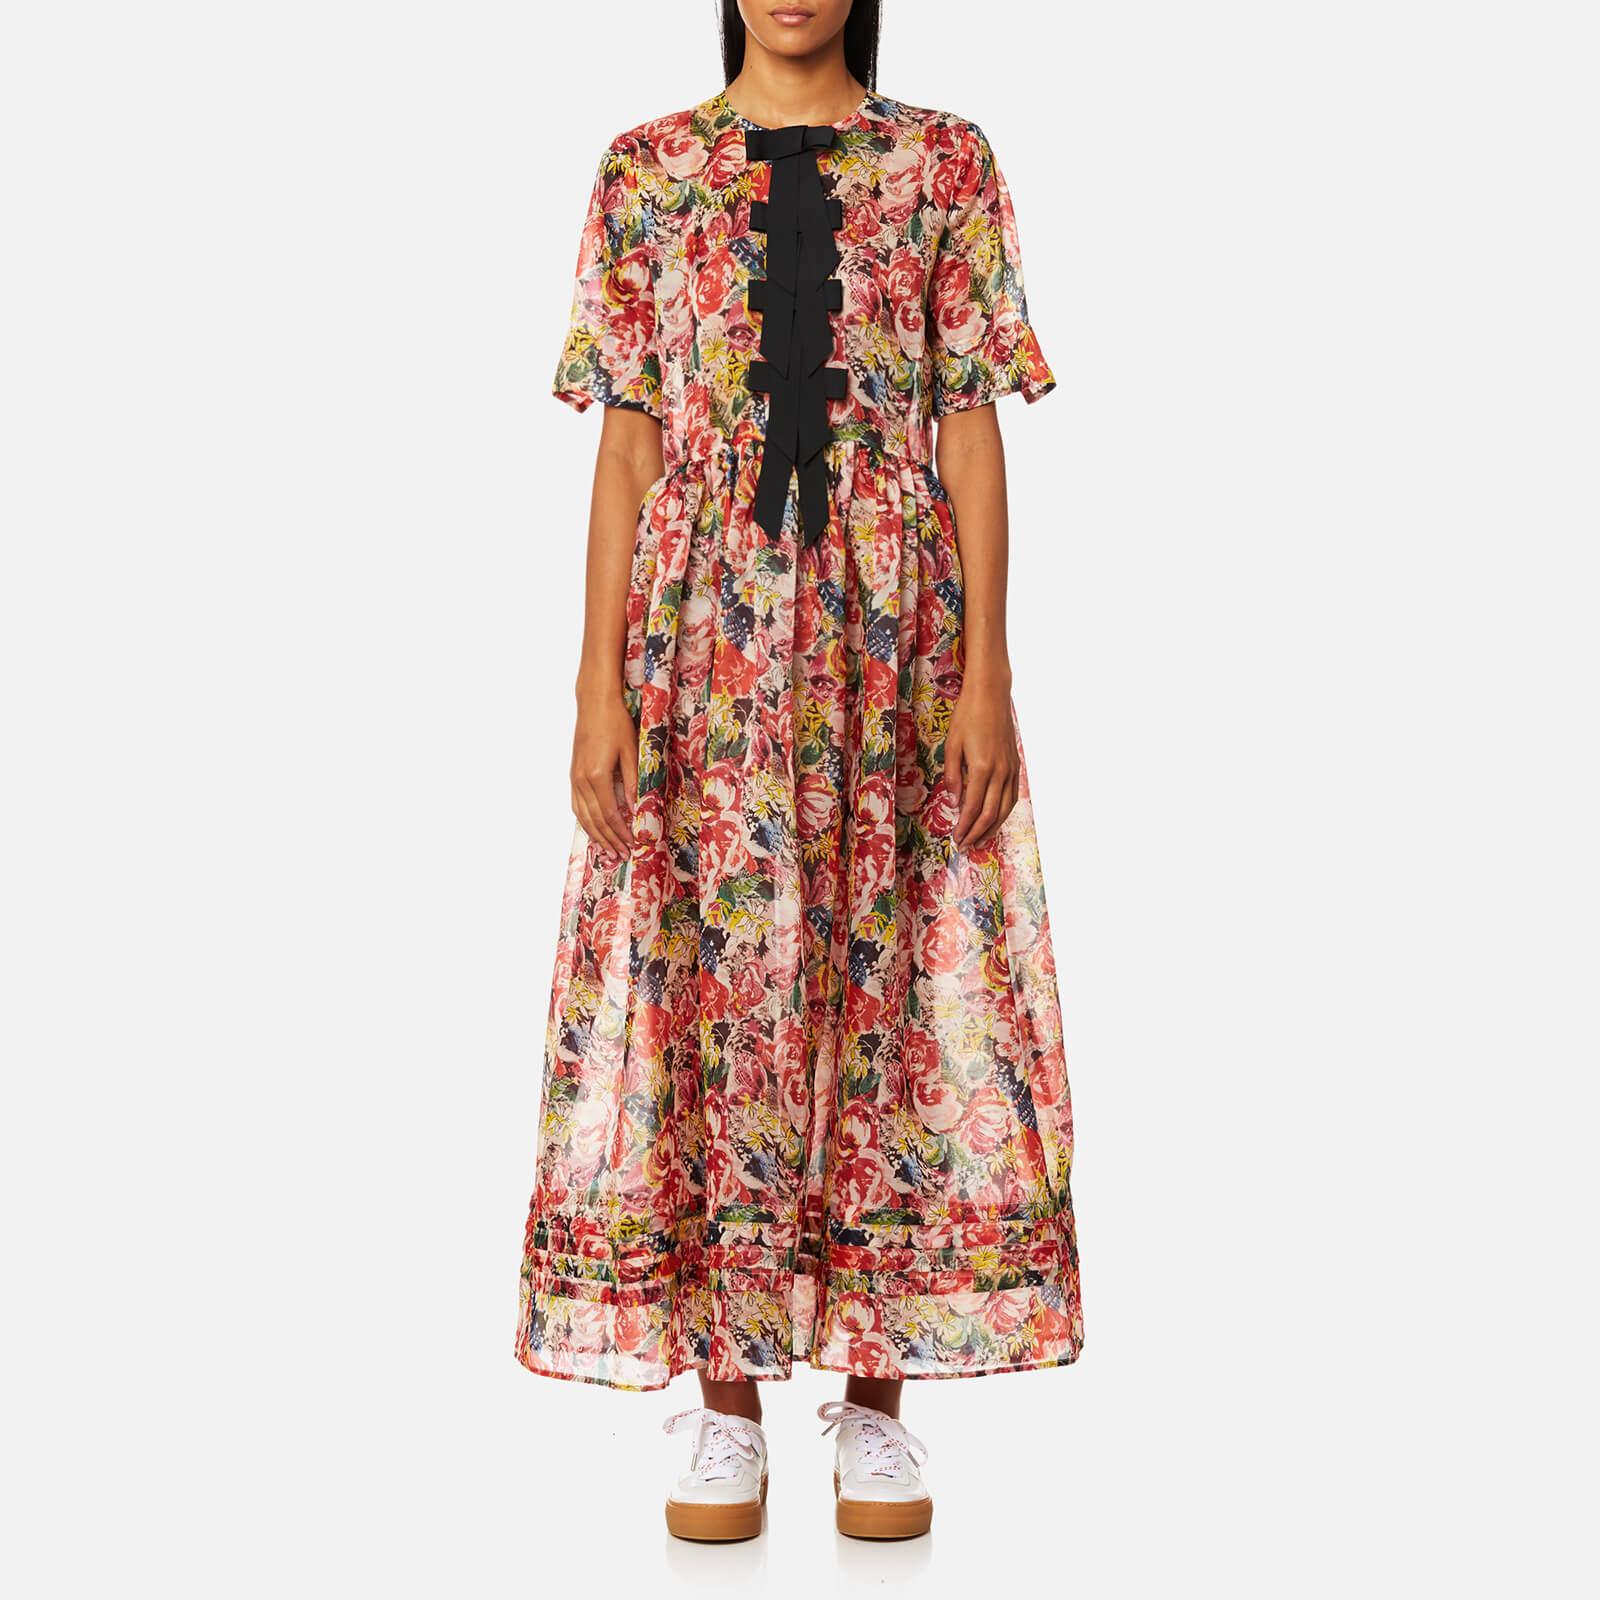 76b169dc Ganni Women's Seneca Silk Dress - Multicolour - Free UK Delivery over £50